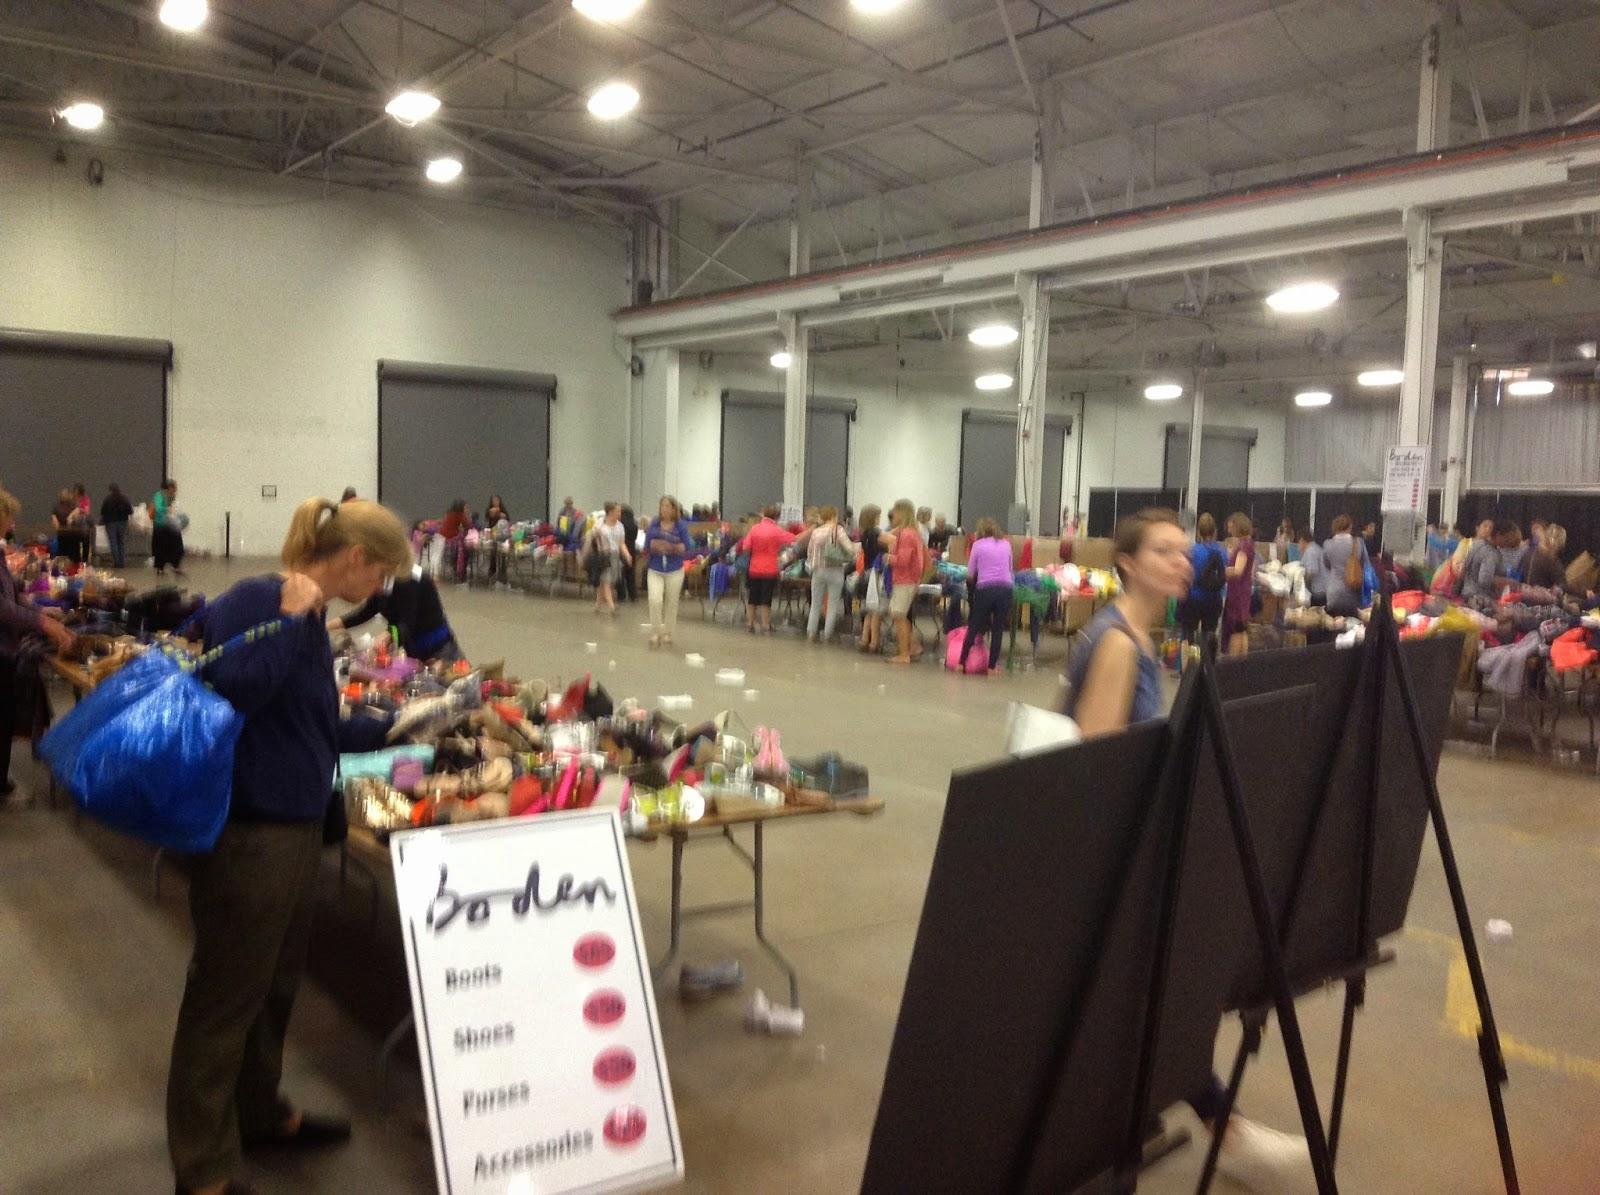 Boston sample sale @ hynes convention center, boston [29 september].